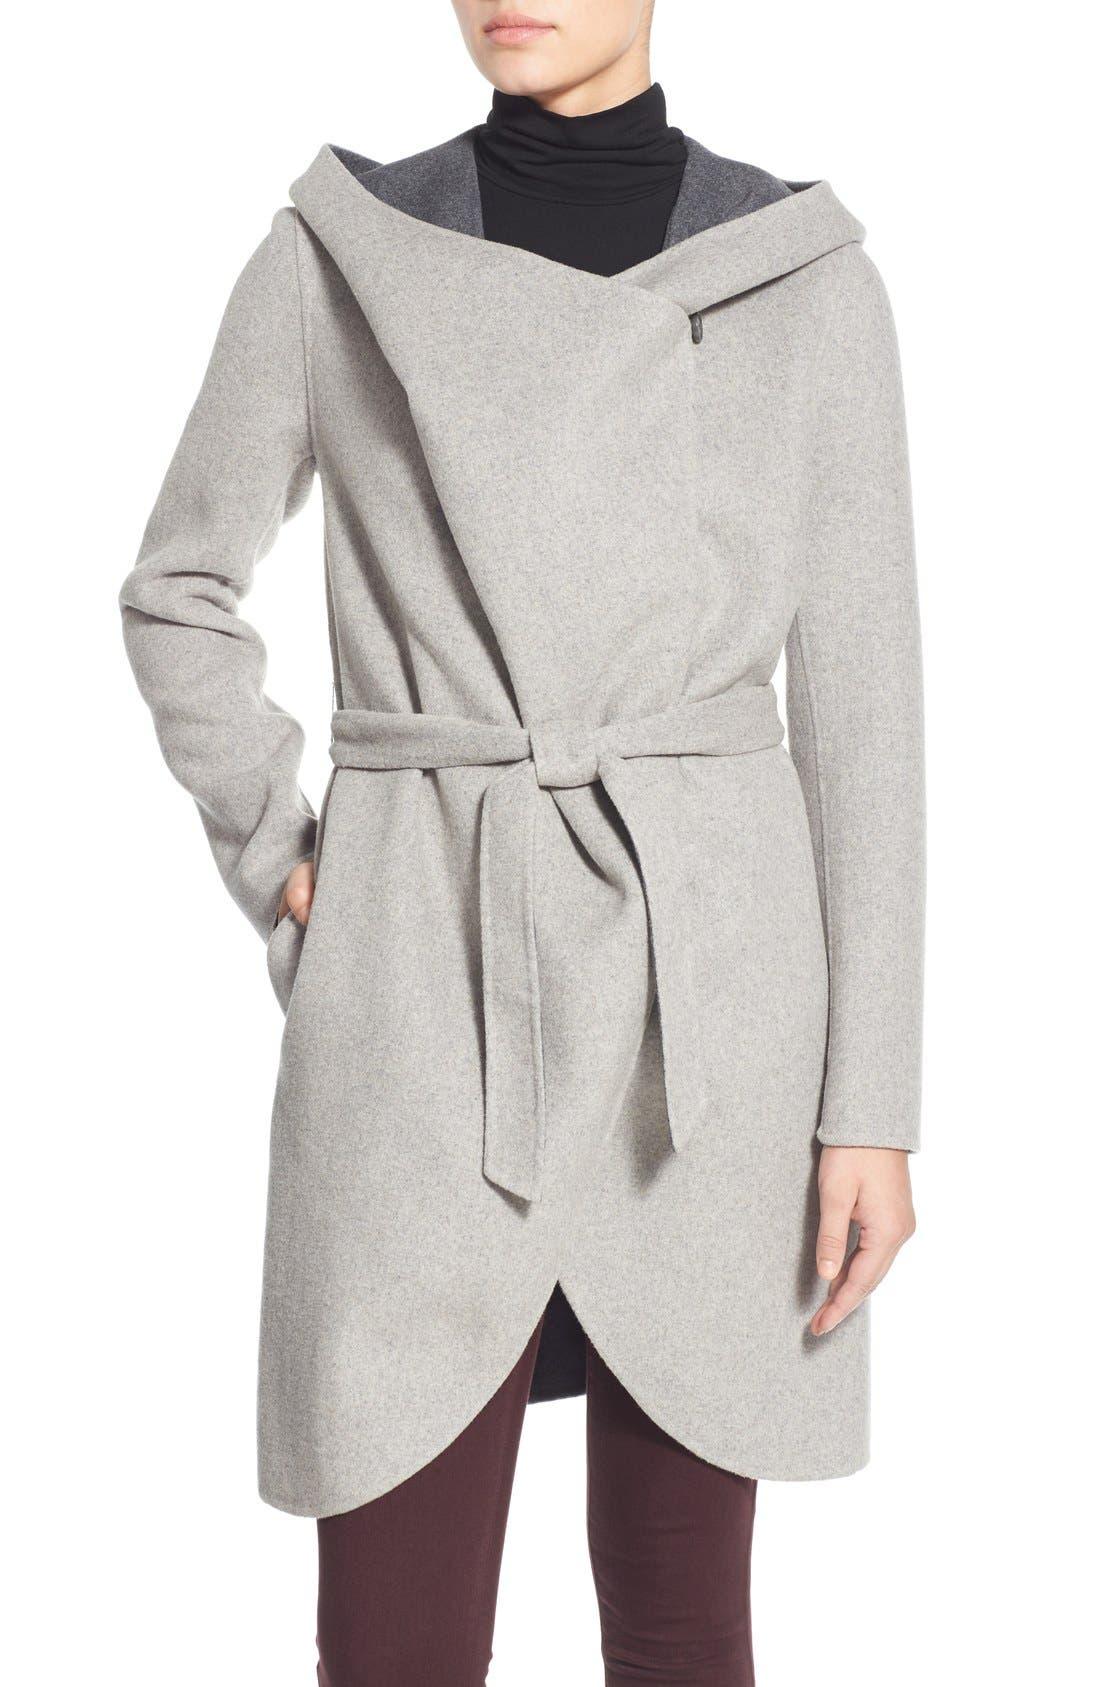 Main Image - Soia & Kyo Reversible Double Face Hooded Wrap Jacket